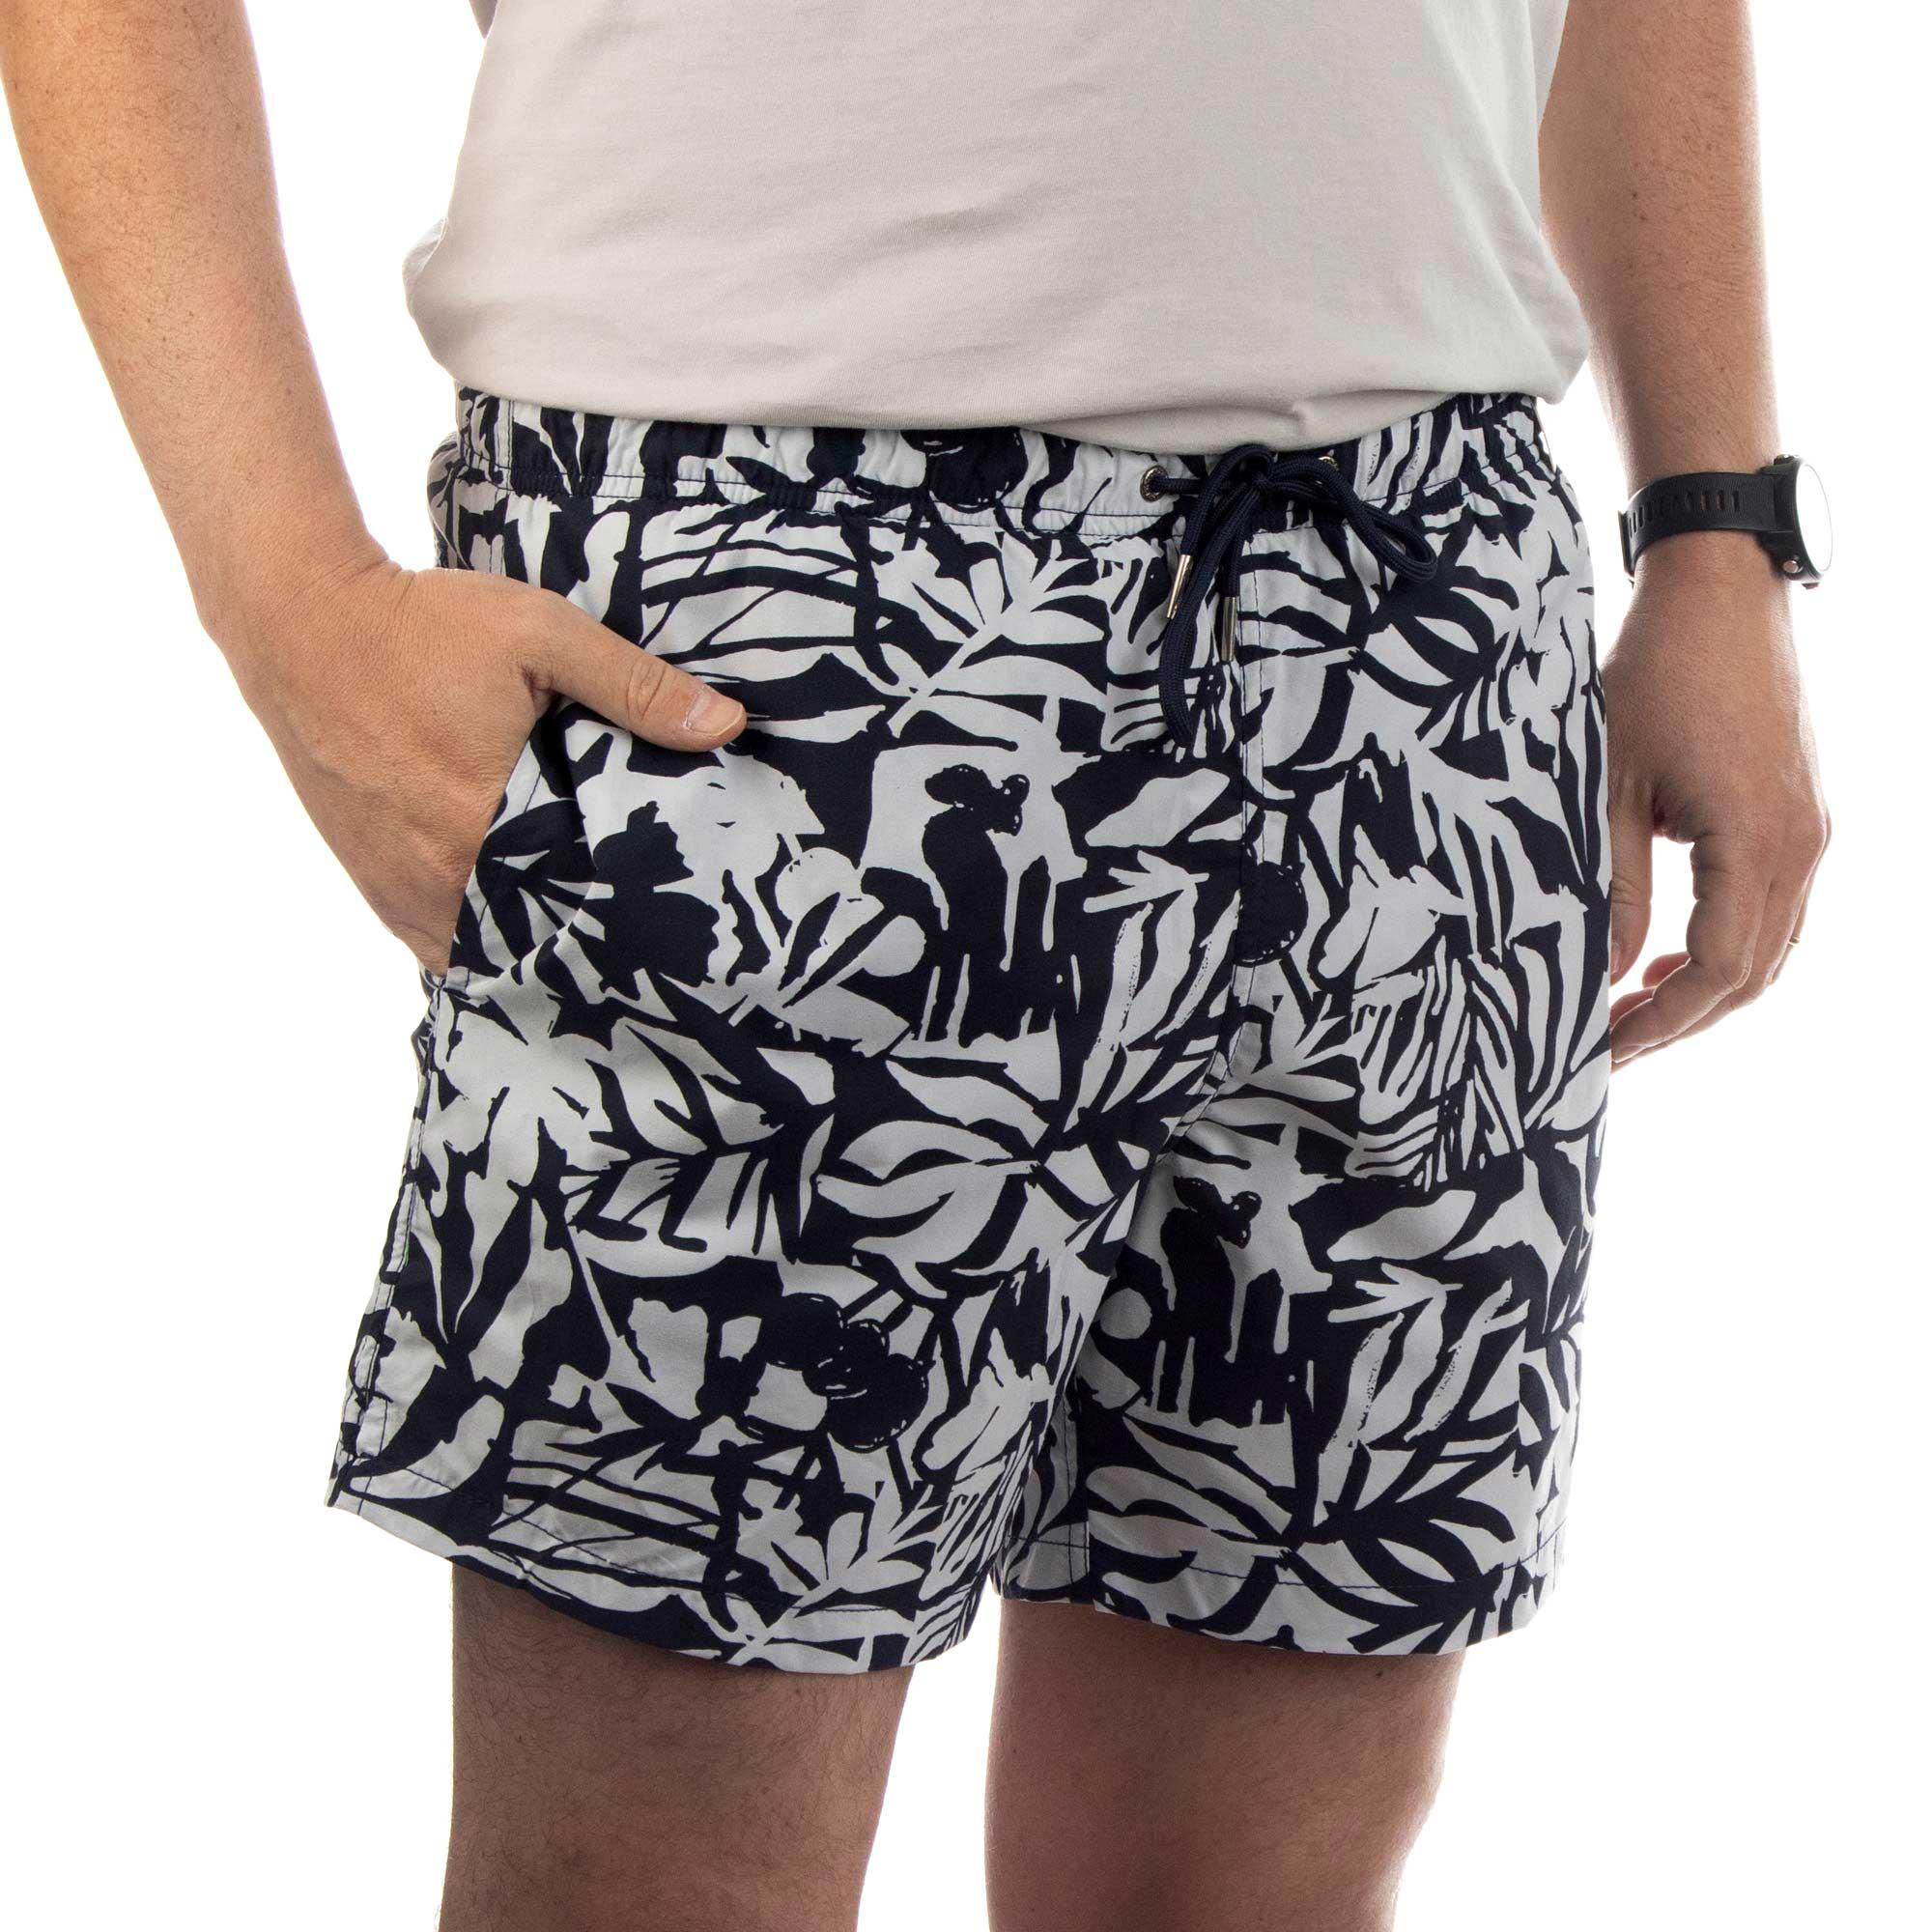 Richards Shorts Printed Beach Masculino Estampa Folhas